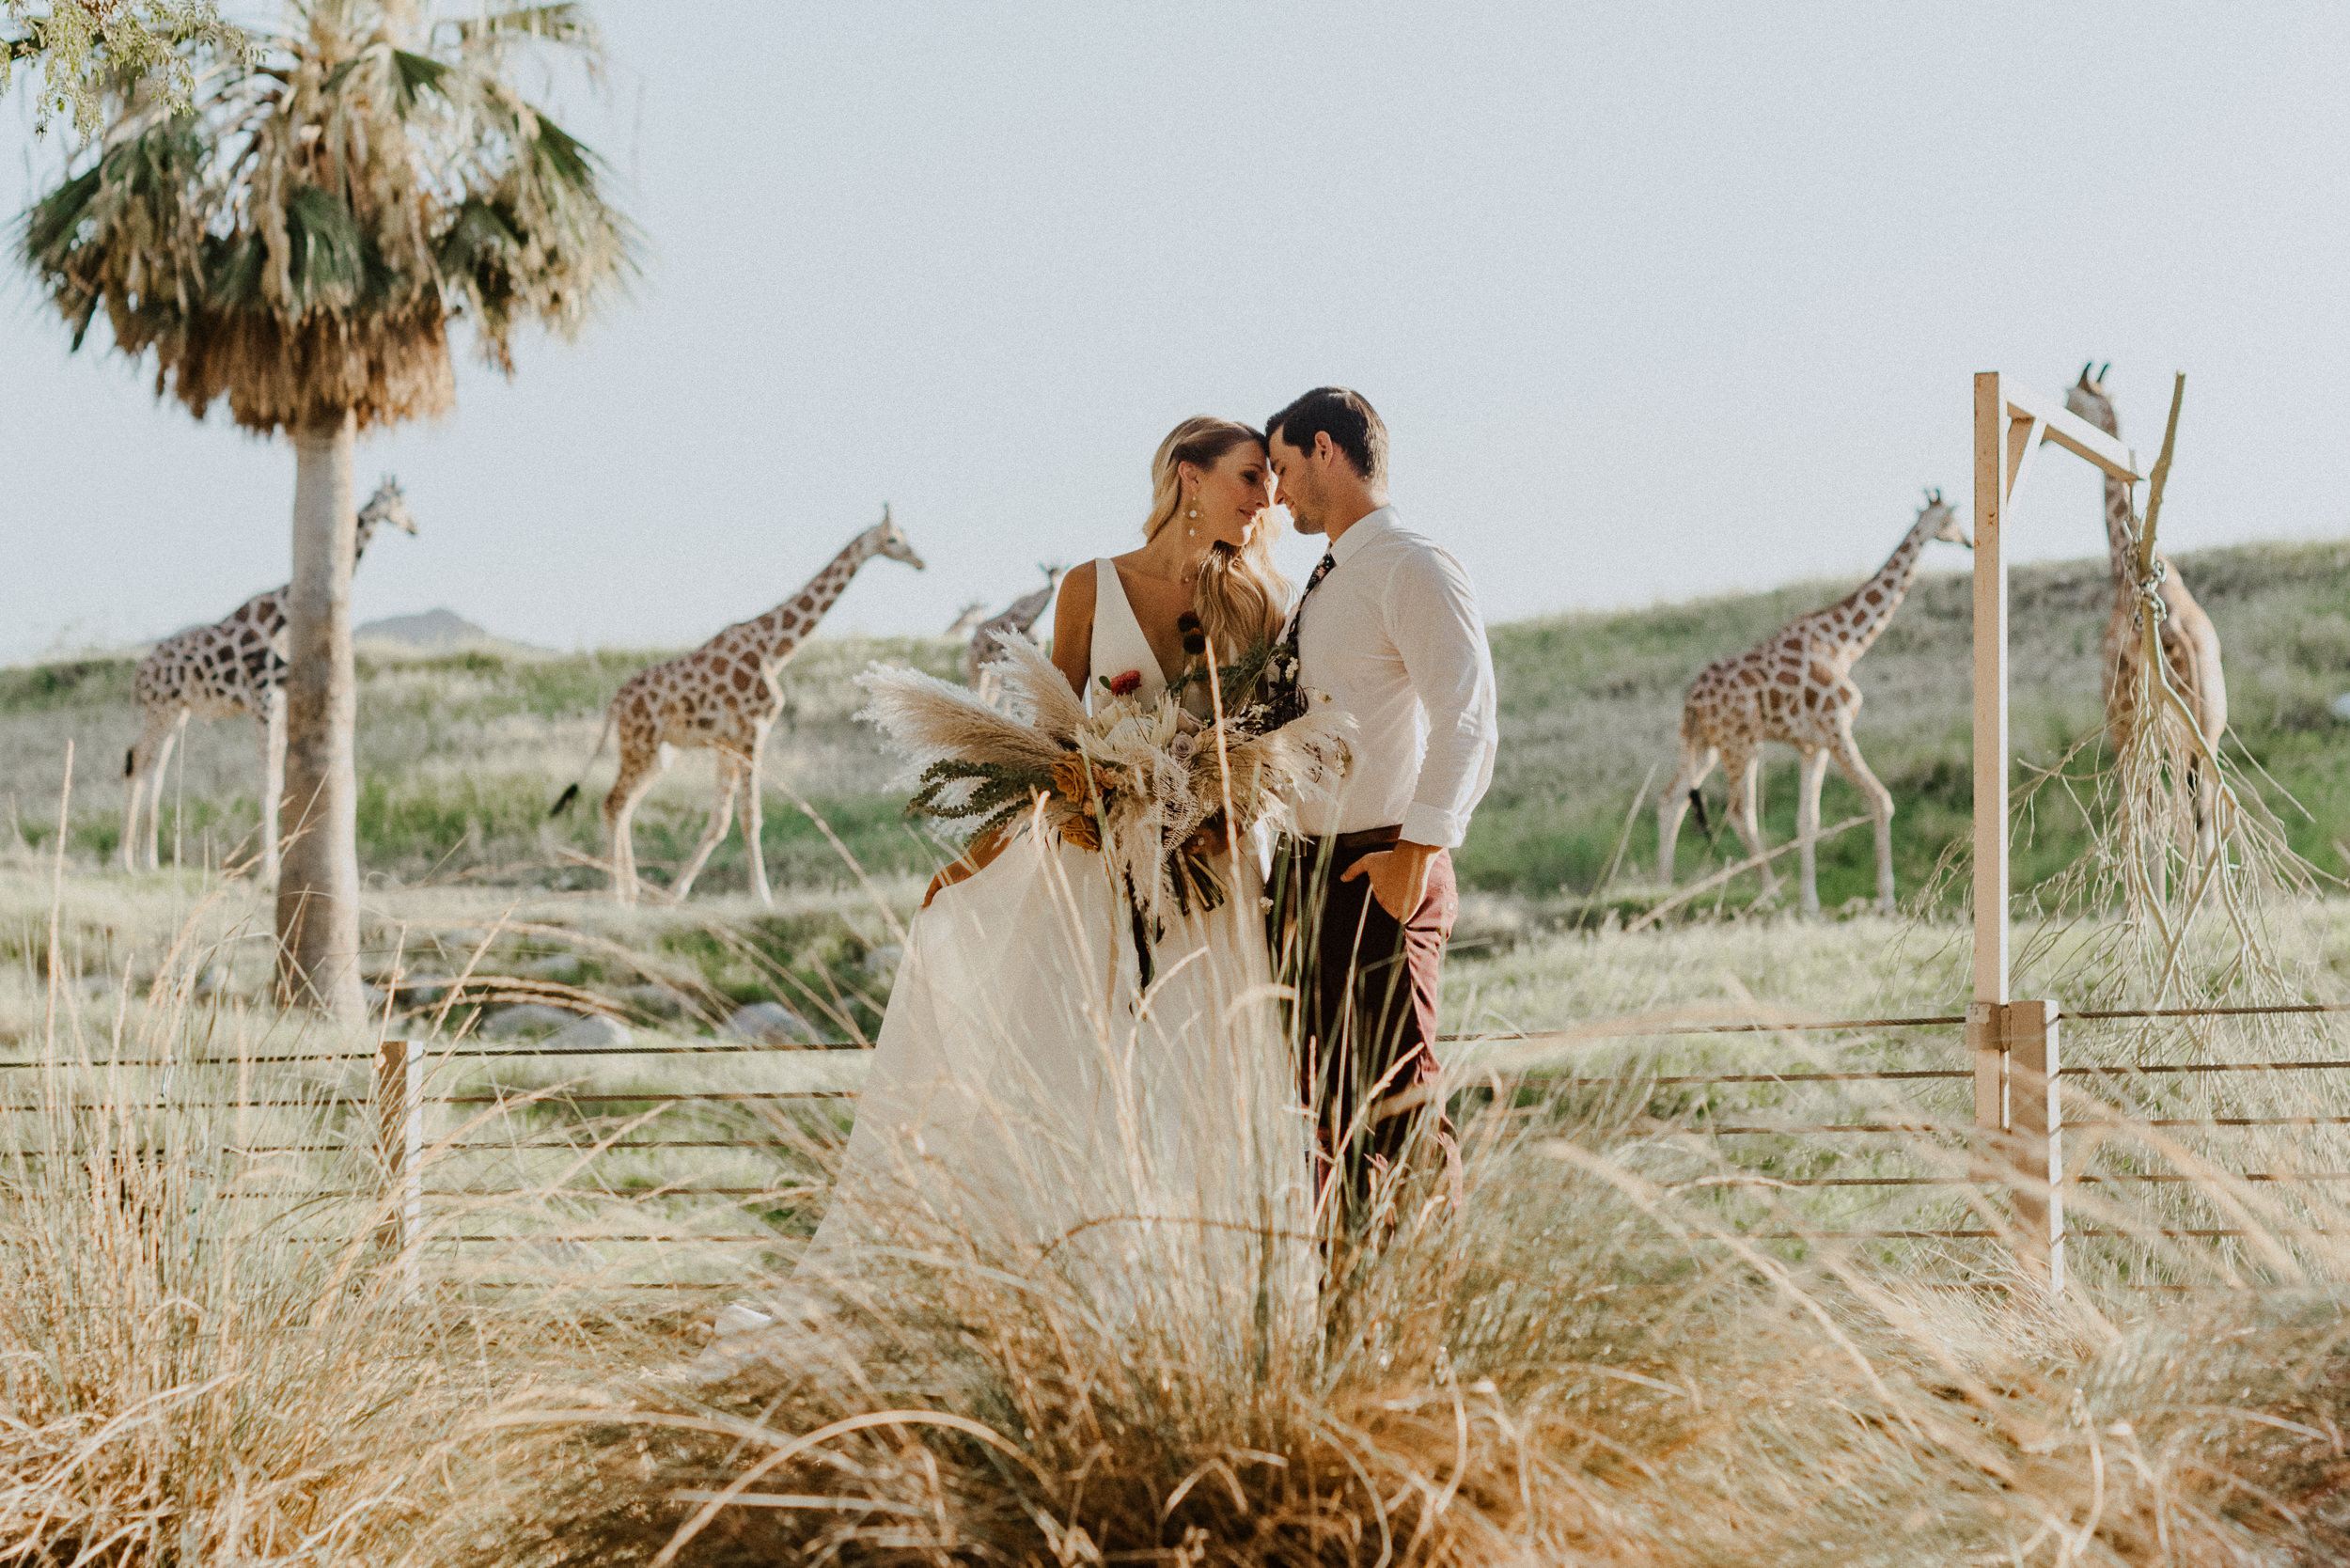 sChelsie + Chris - The Desert Shootout Wedding Romantics at The Living Desert-70.jpg